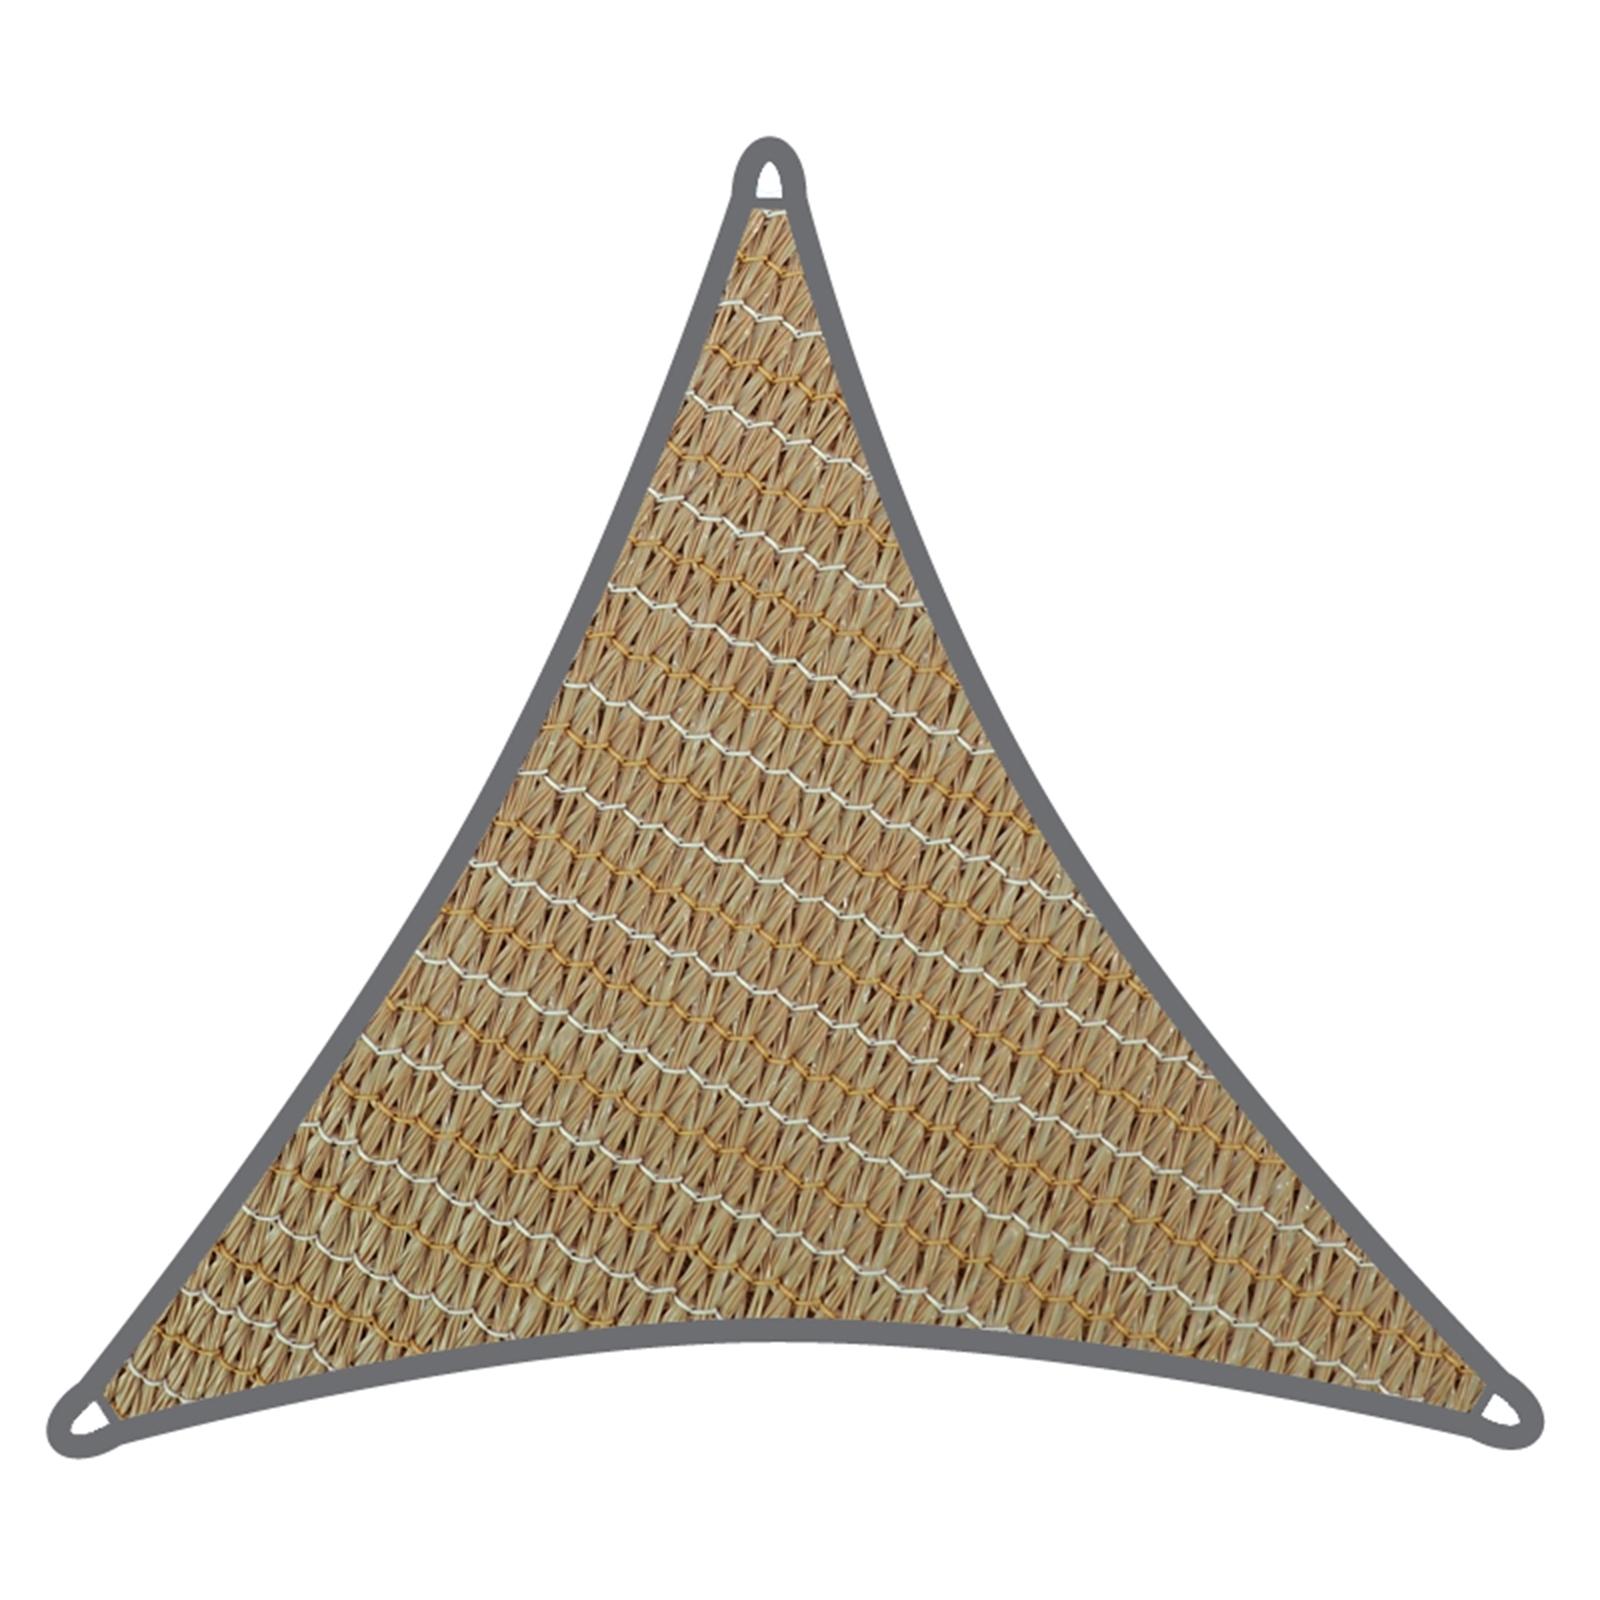 Coolaroo 3m Beech Triangle Commercial Grade Shade Sail